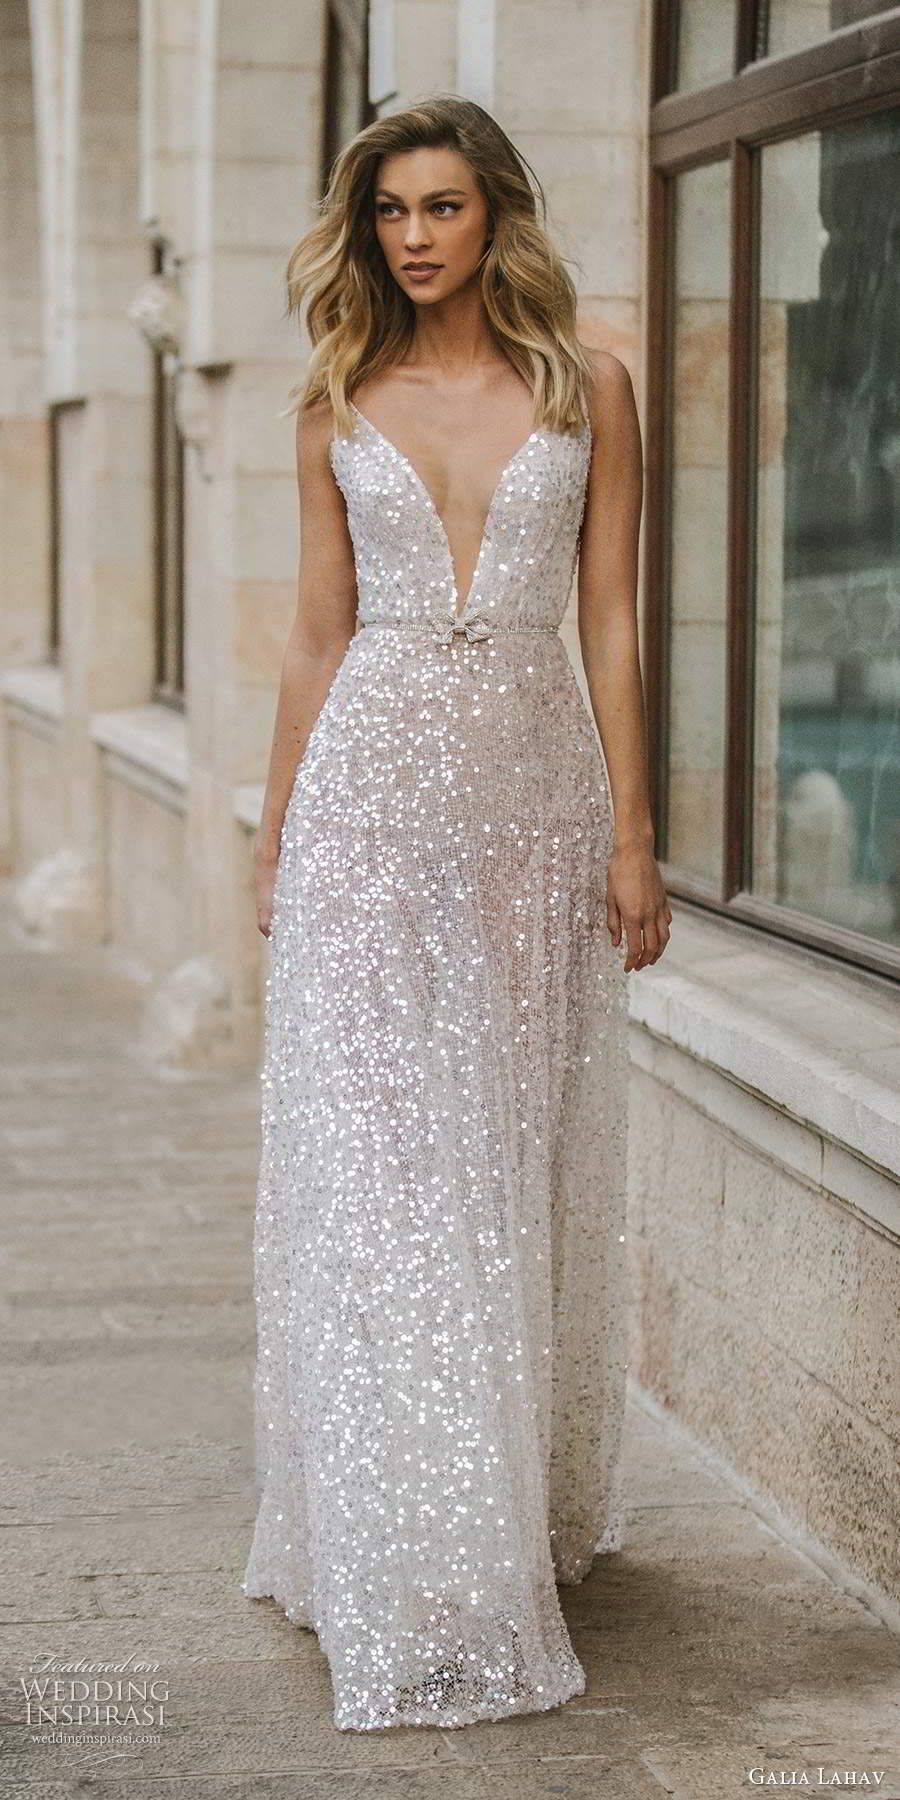 Galia Lahav S Gala Collection No Ix Wedding Dresses The Street Vibe Shoot Wedding Inspirasi In 2020 Sparkly Wedding Dress Elegant Wedding Dress Sparkly Wedding